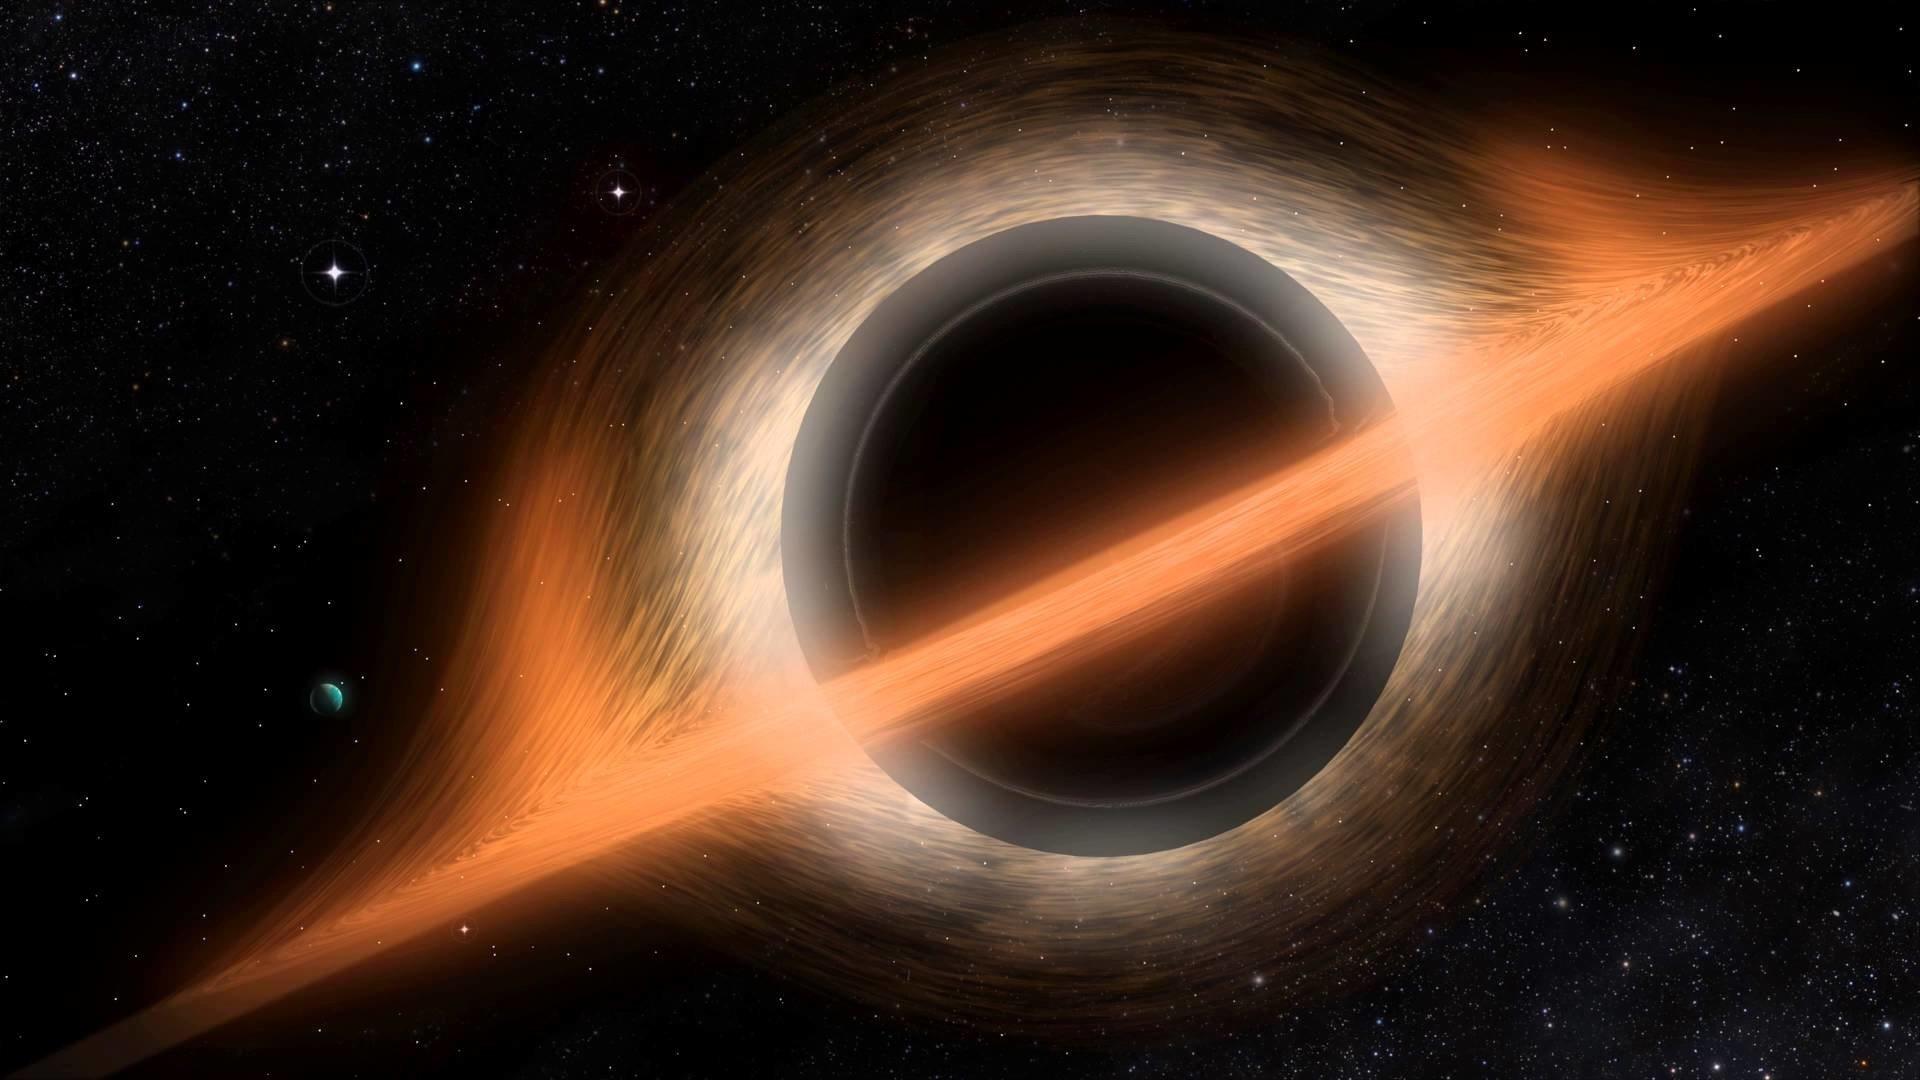 Interstellar Style Black Hole Visualization (4K Ultra High Definition)